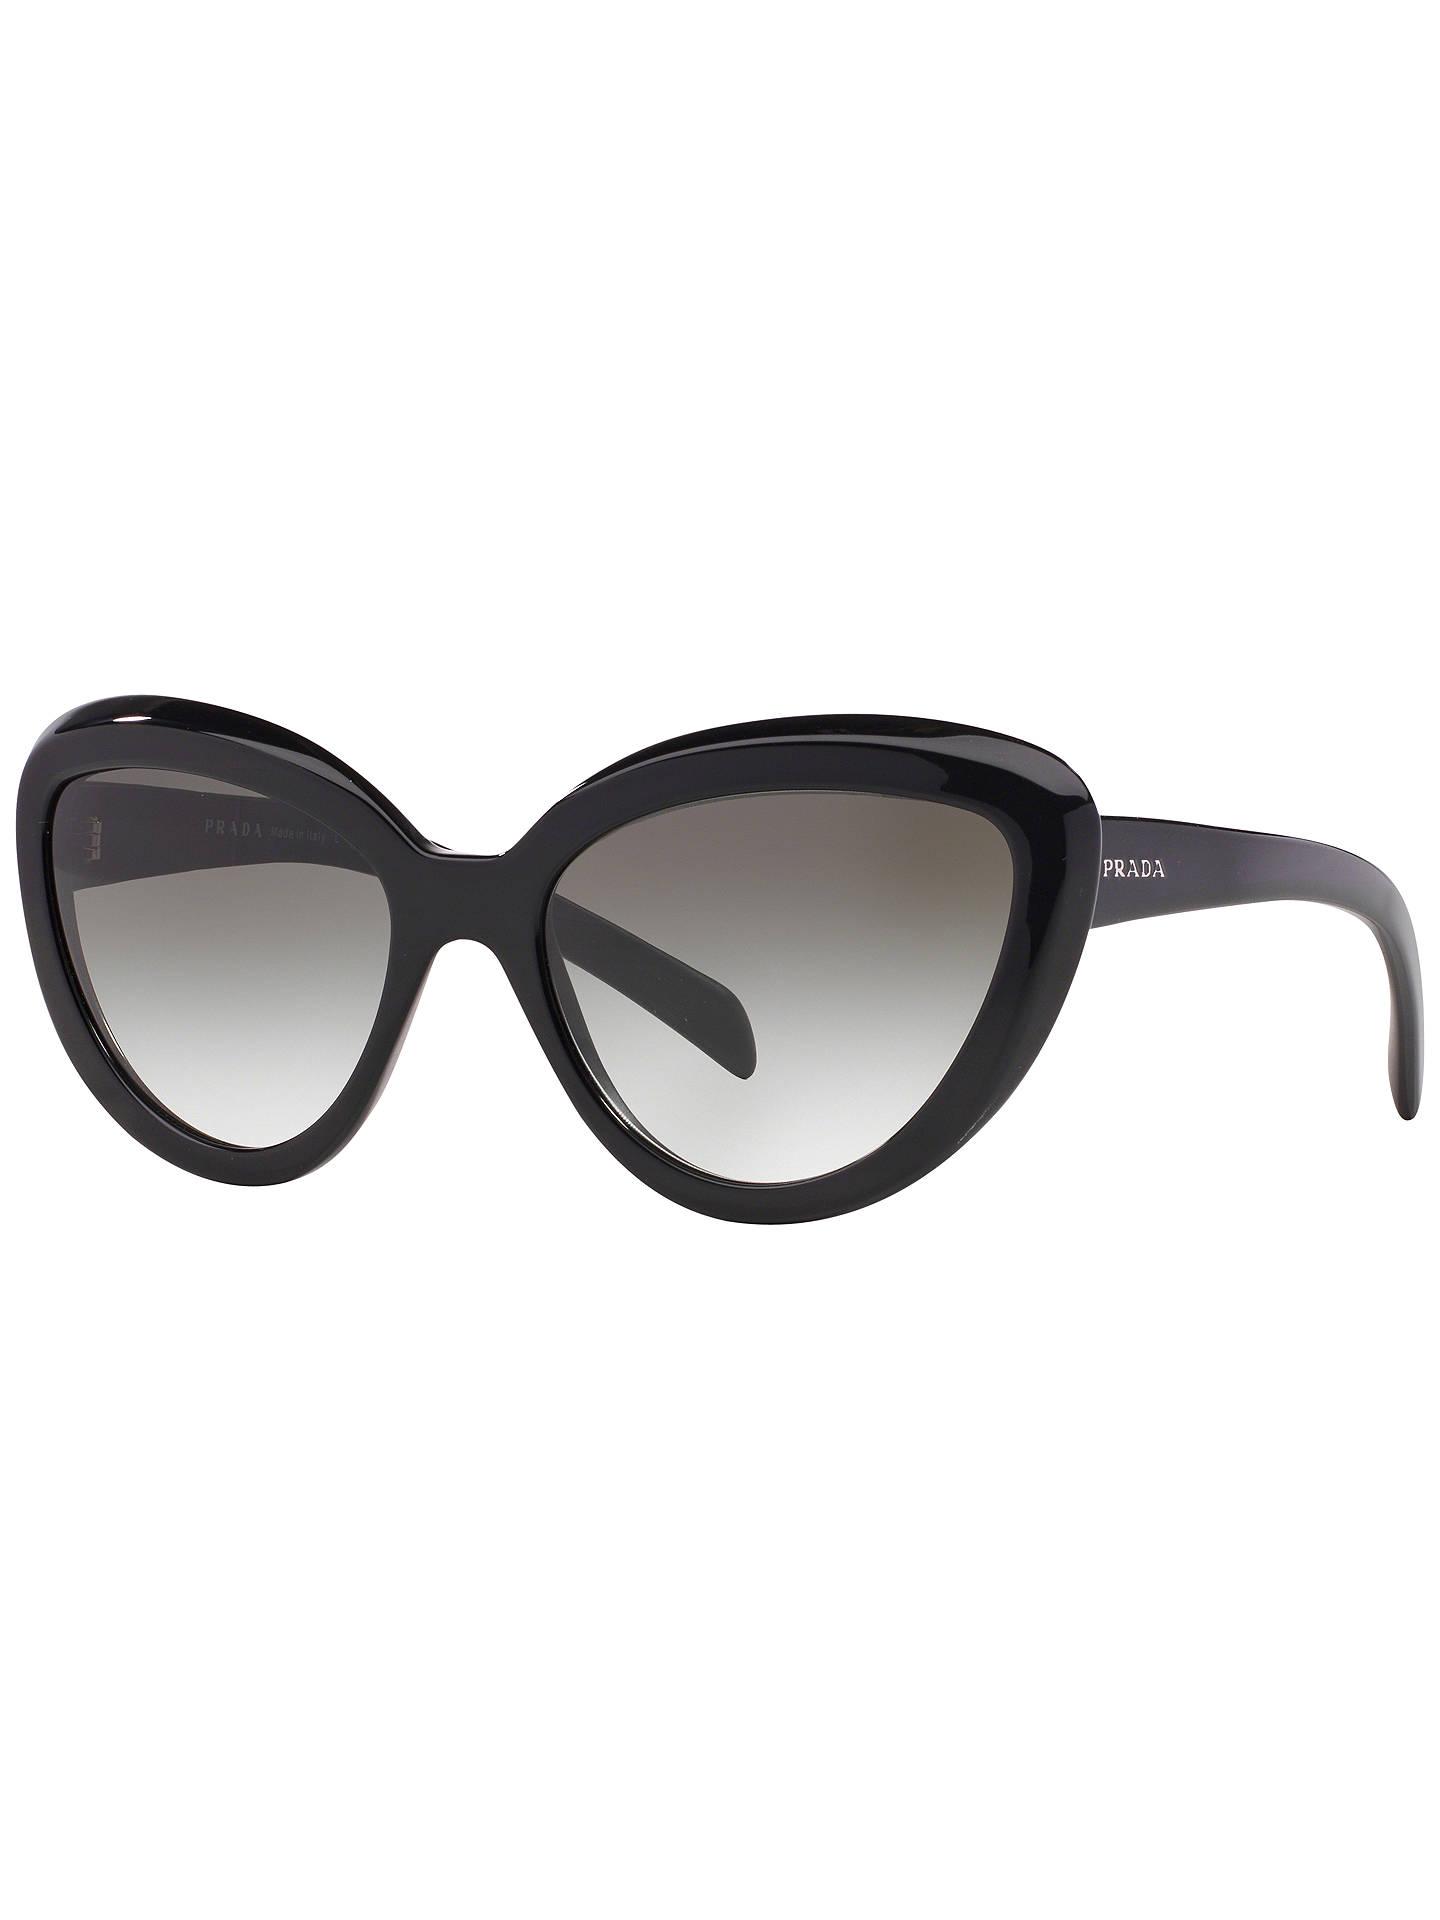 f4b5909fecef Buy Prada PR08RS Cat's Eye Sunglasses, Black Online at johnlewis.com